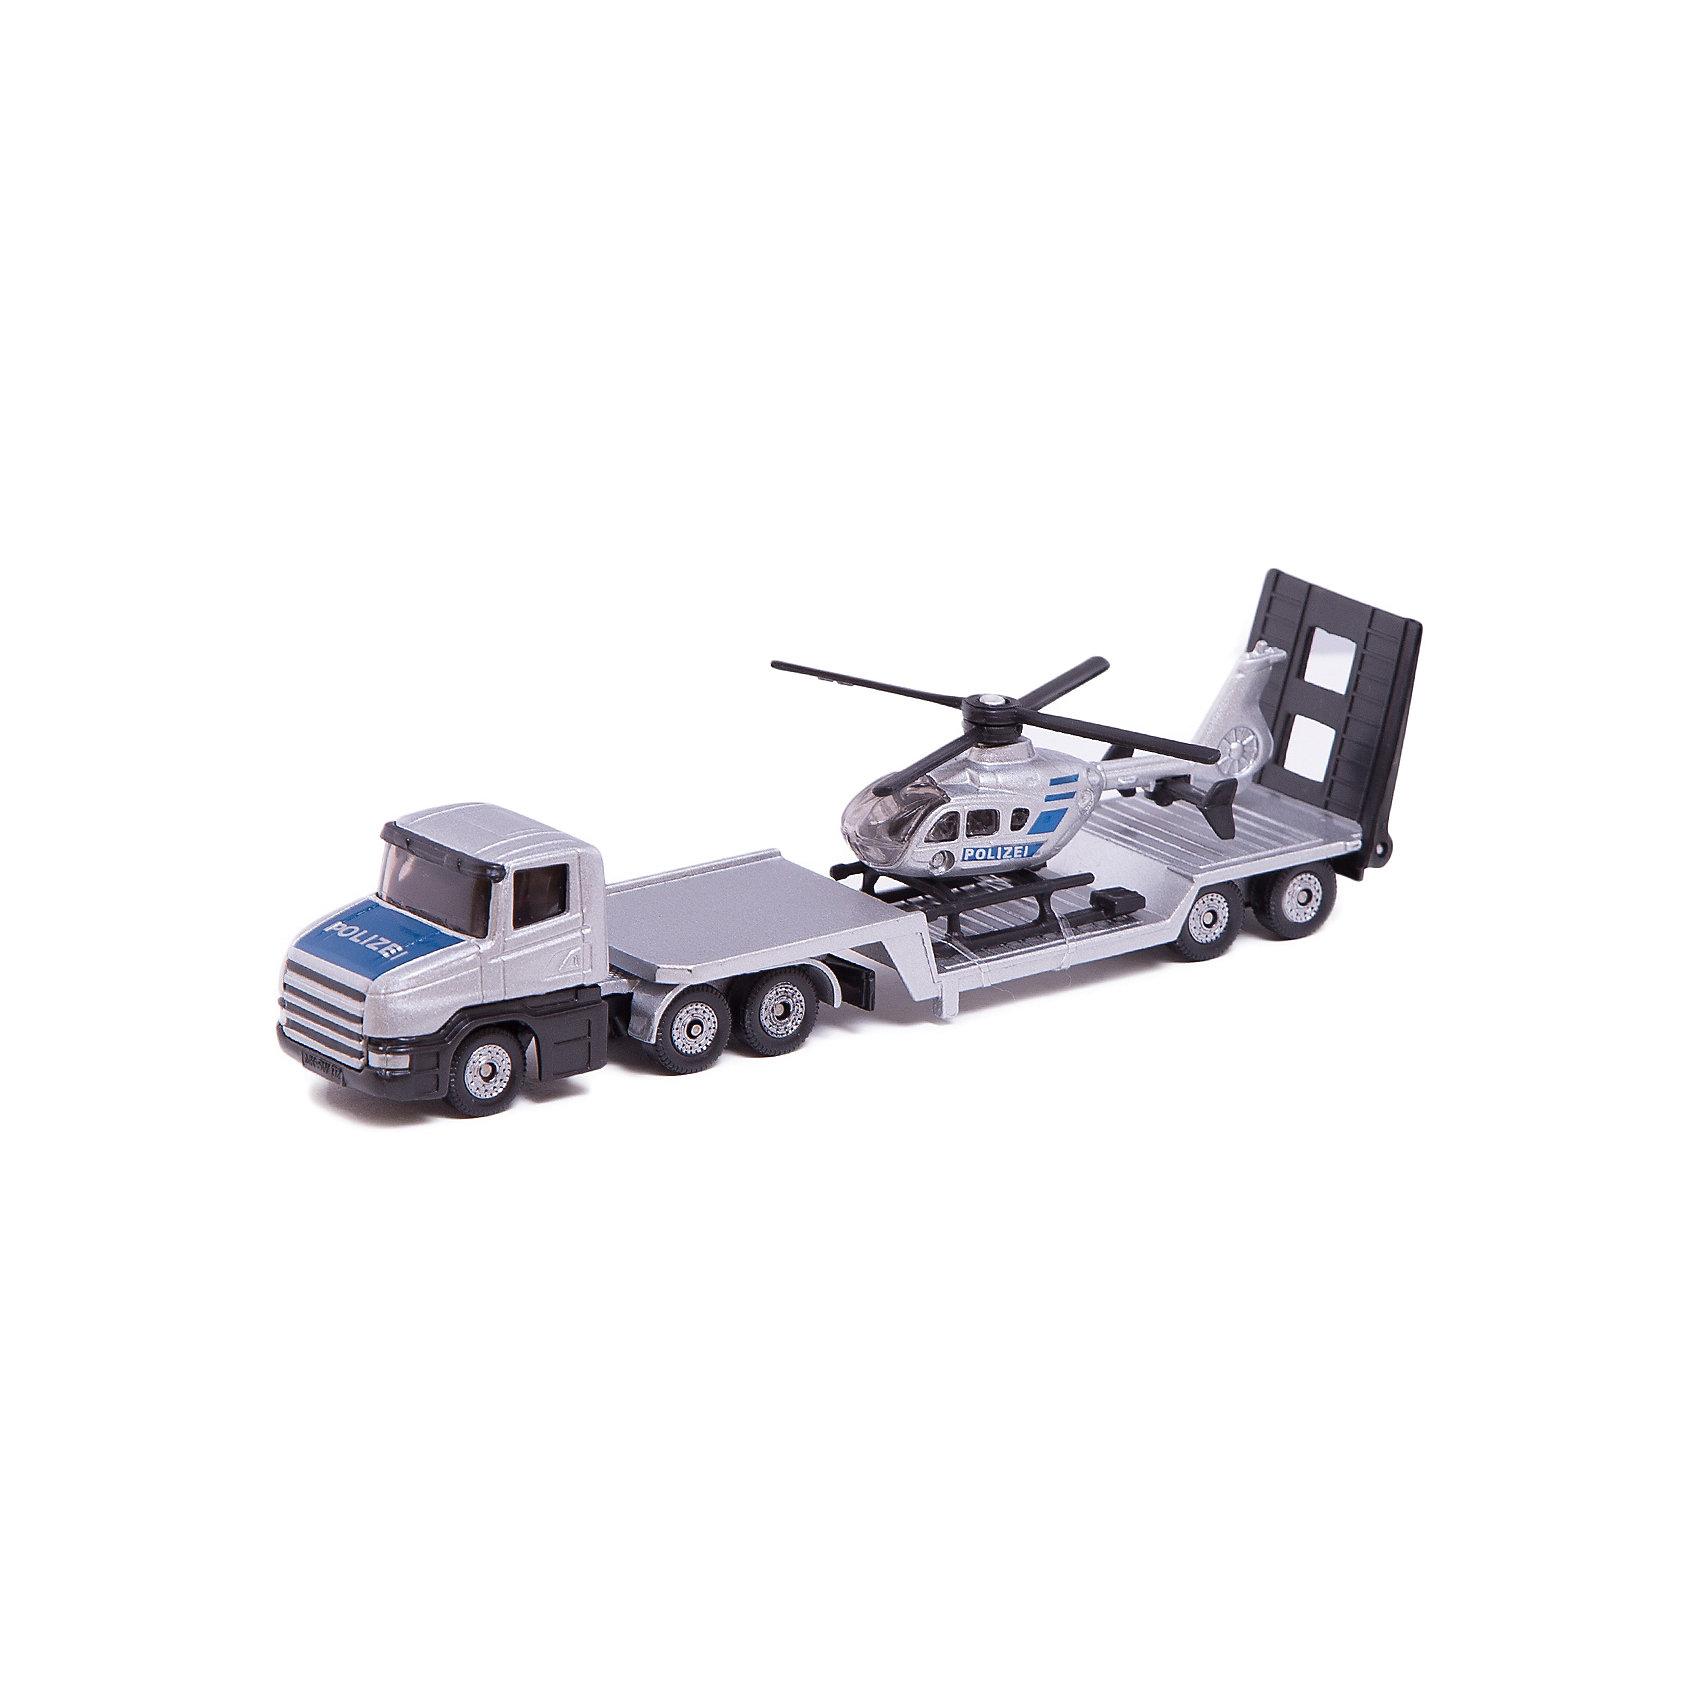 SIKU SIKU 1610 Низкорамный грузовик с вертолетом siku siku 1610 низкорамный грузовик с вертолетом